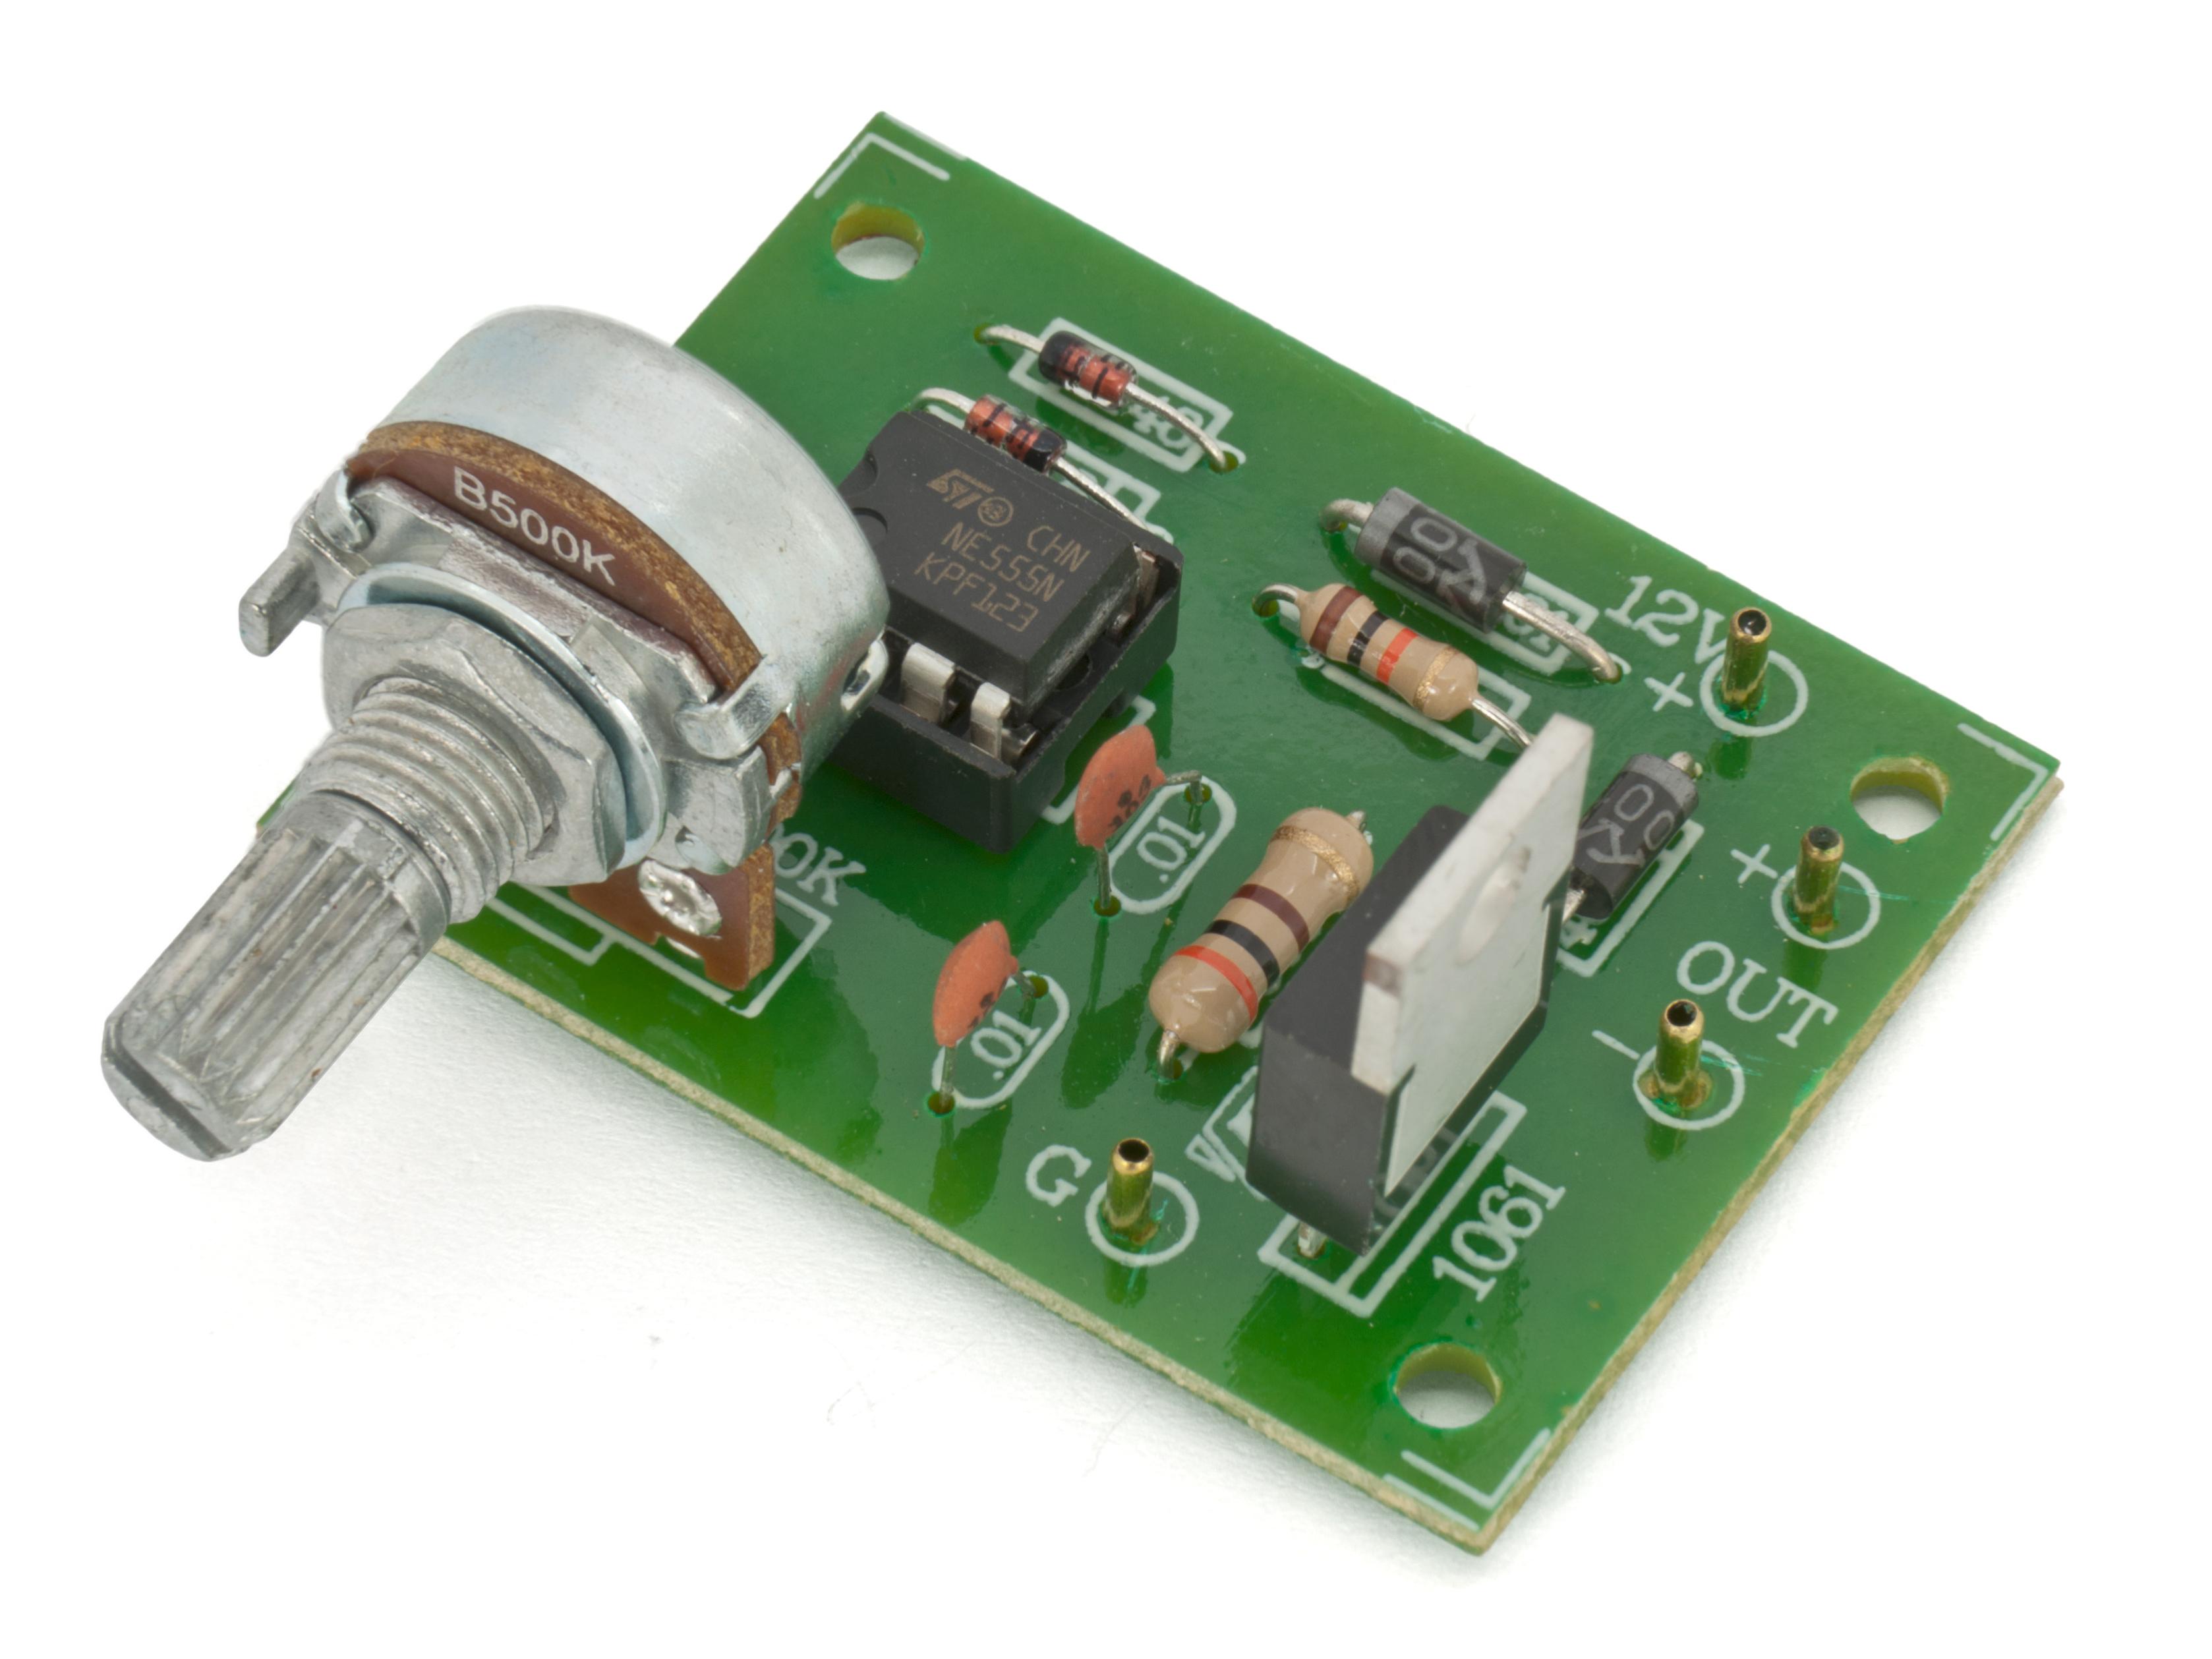 DC motor speed controller / LED dimmer 15V 0 5A